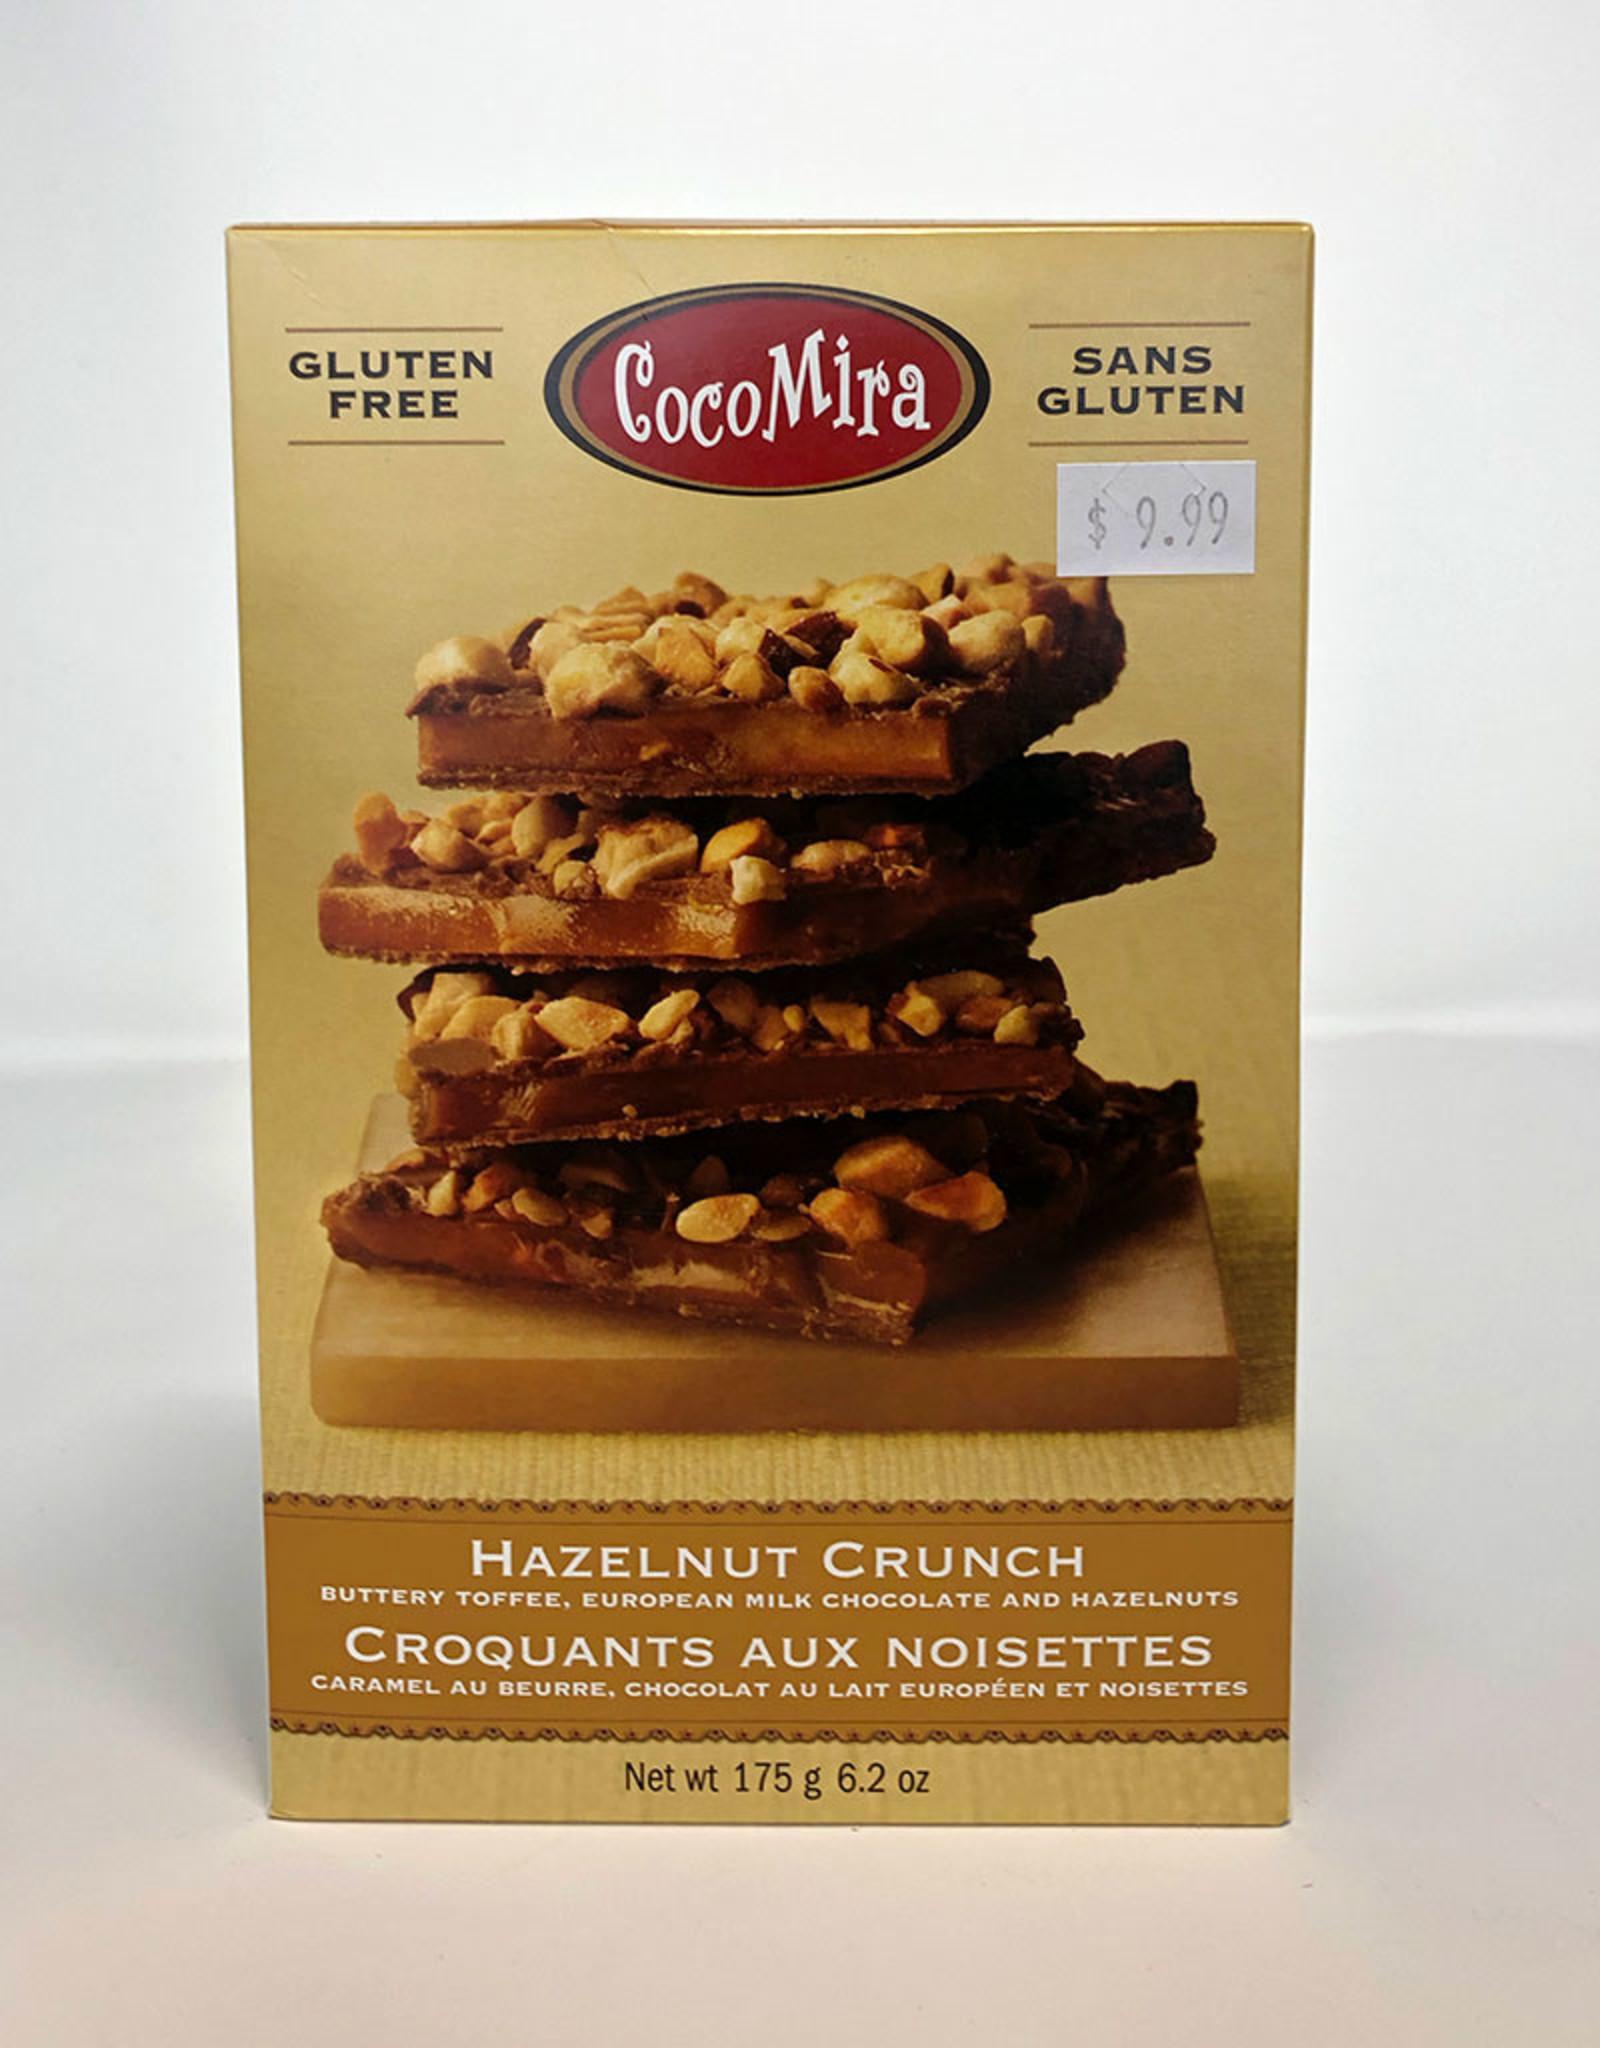 Cocomira Cocomira - Hazelnut Crunch (175g)